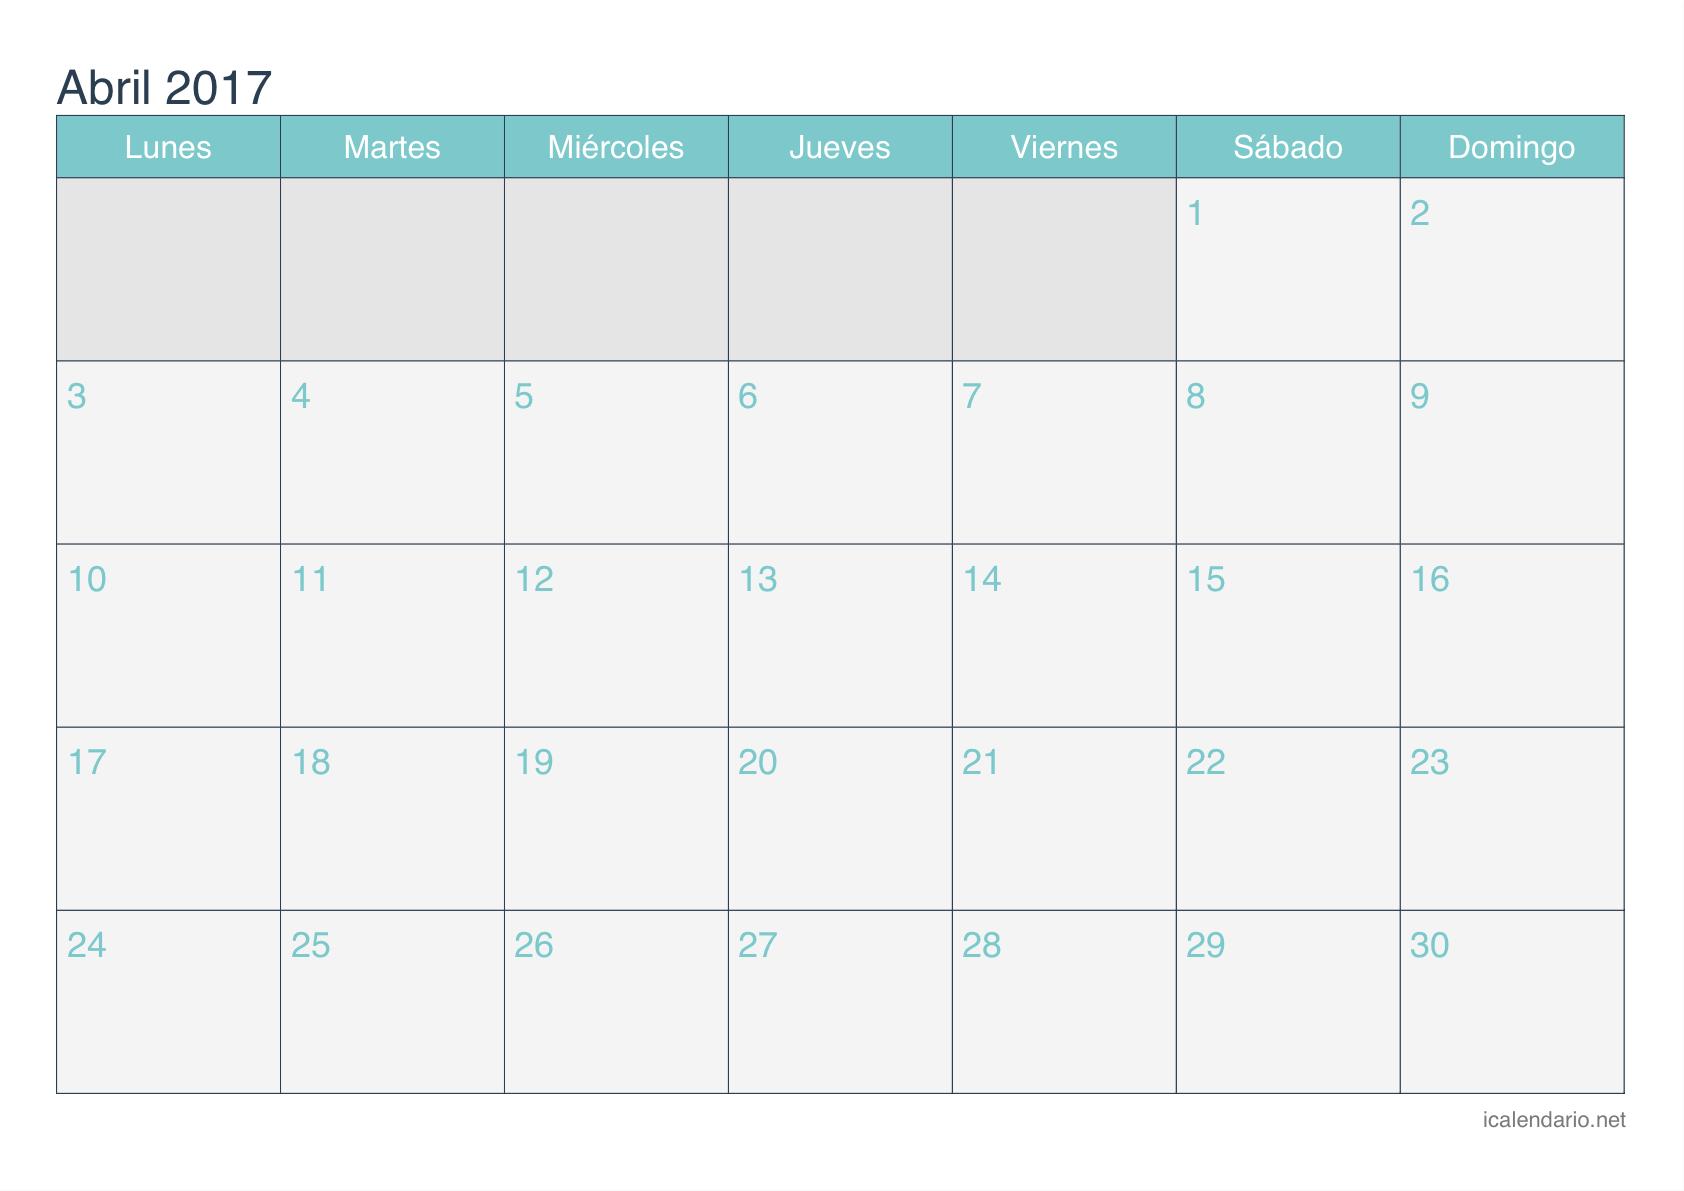 Calendario Para Escribir.Resultado De Imagen Para Calendario 2017 Con Espacio Para Escribir